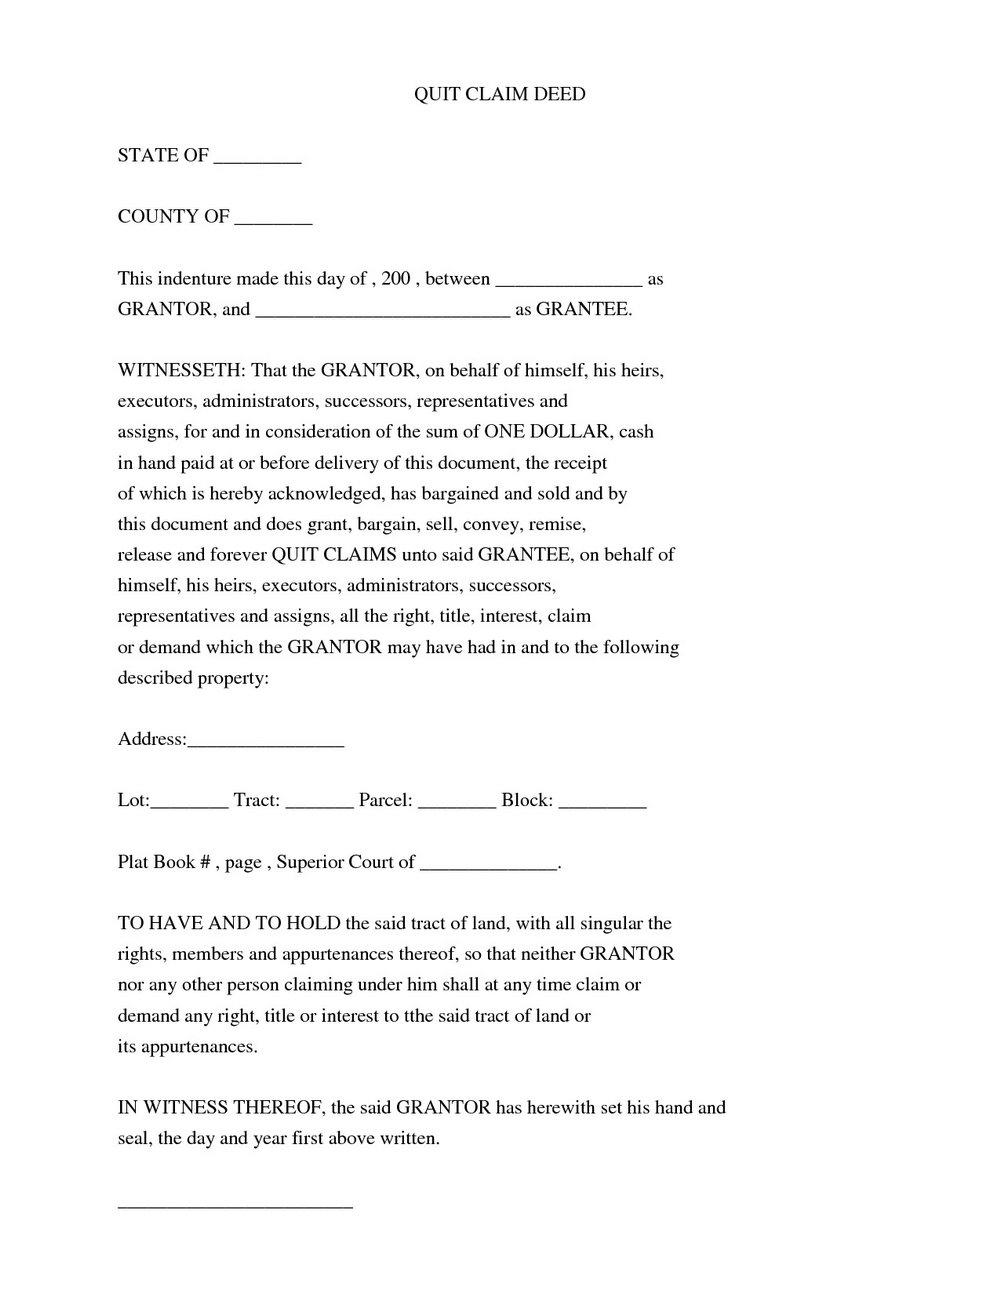 Free Quick Claim Deed Form Nevada